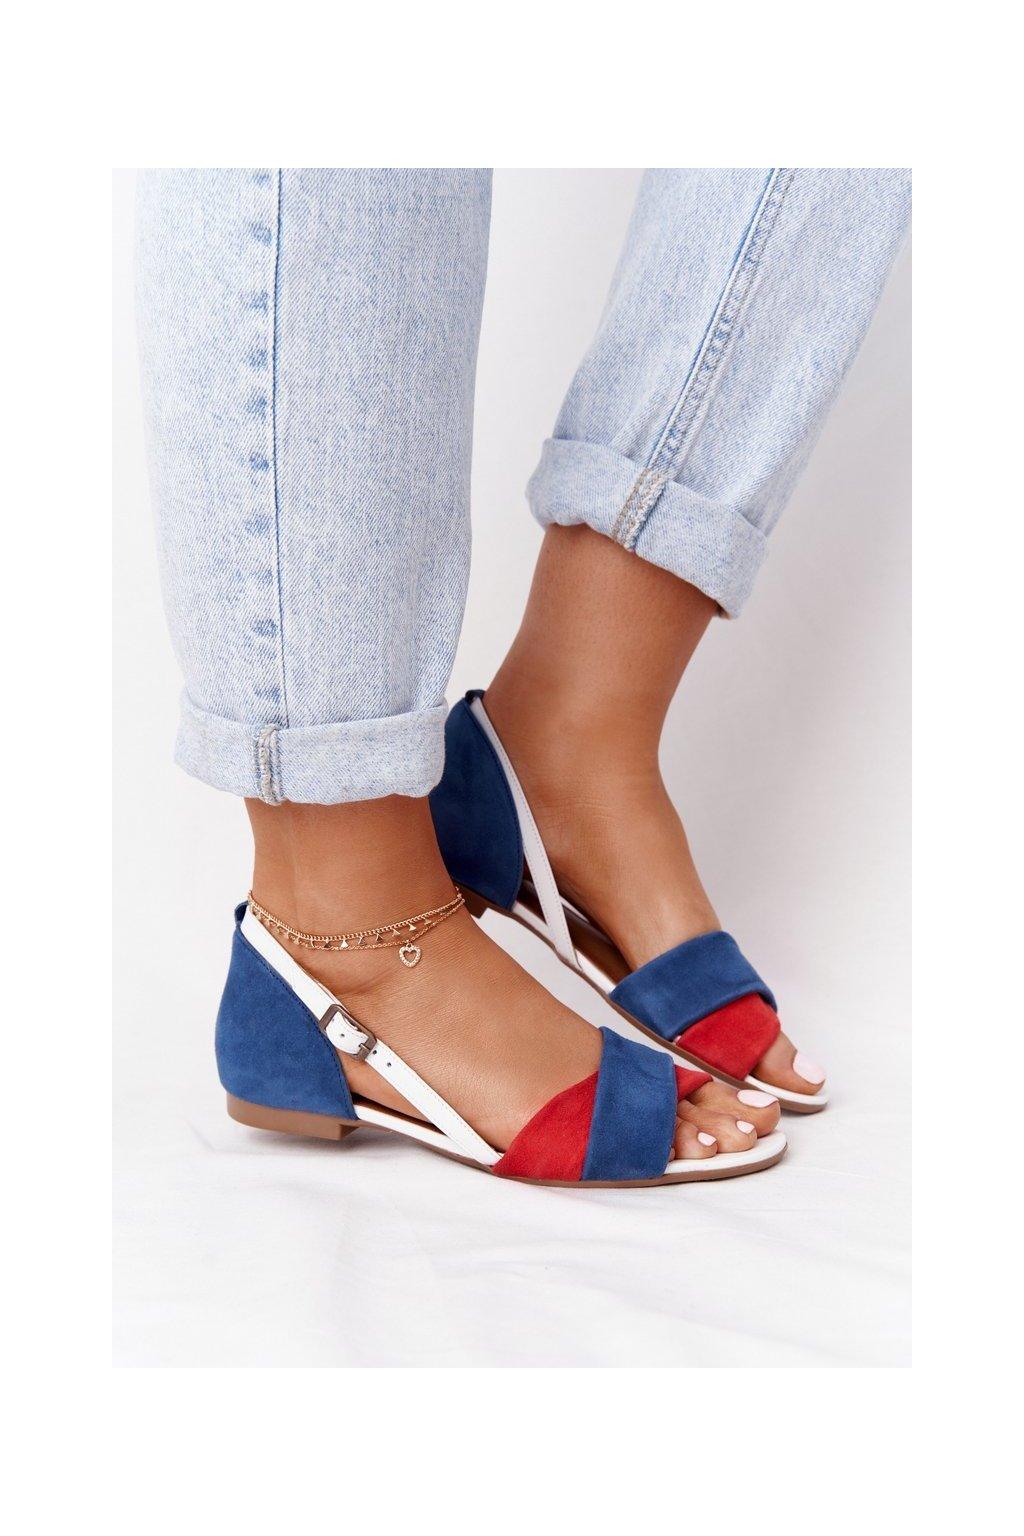 Dámske sandále s plochou podrážkou farba modrá kód obuvi 04614-17/00-5 GRANAT, CZERWONY